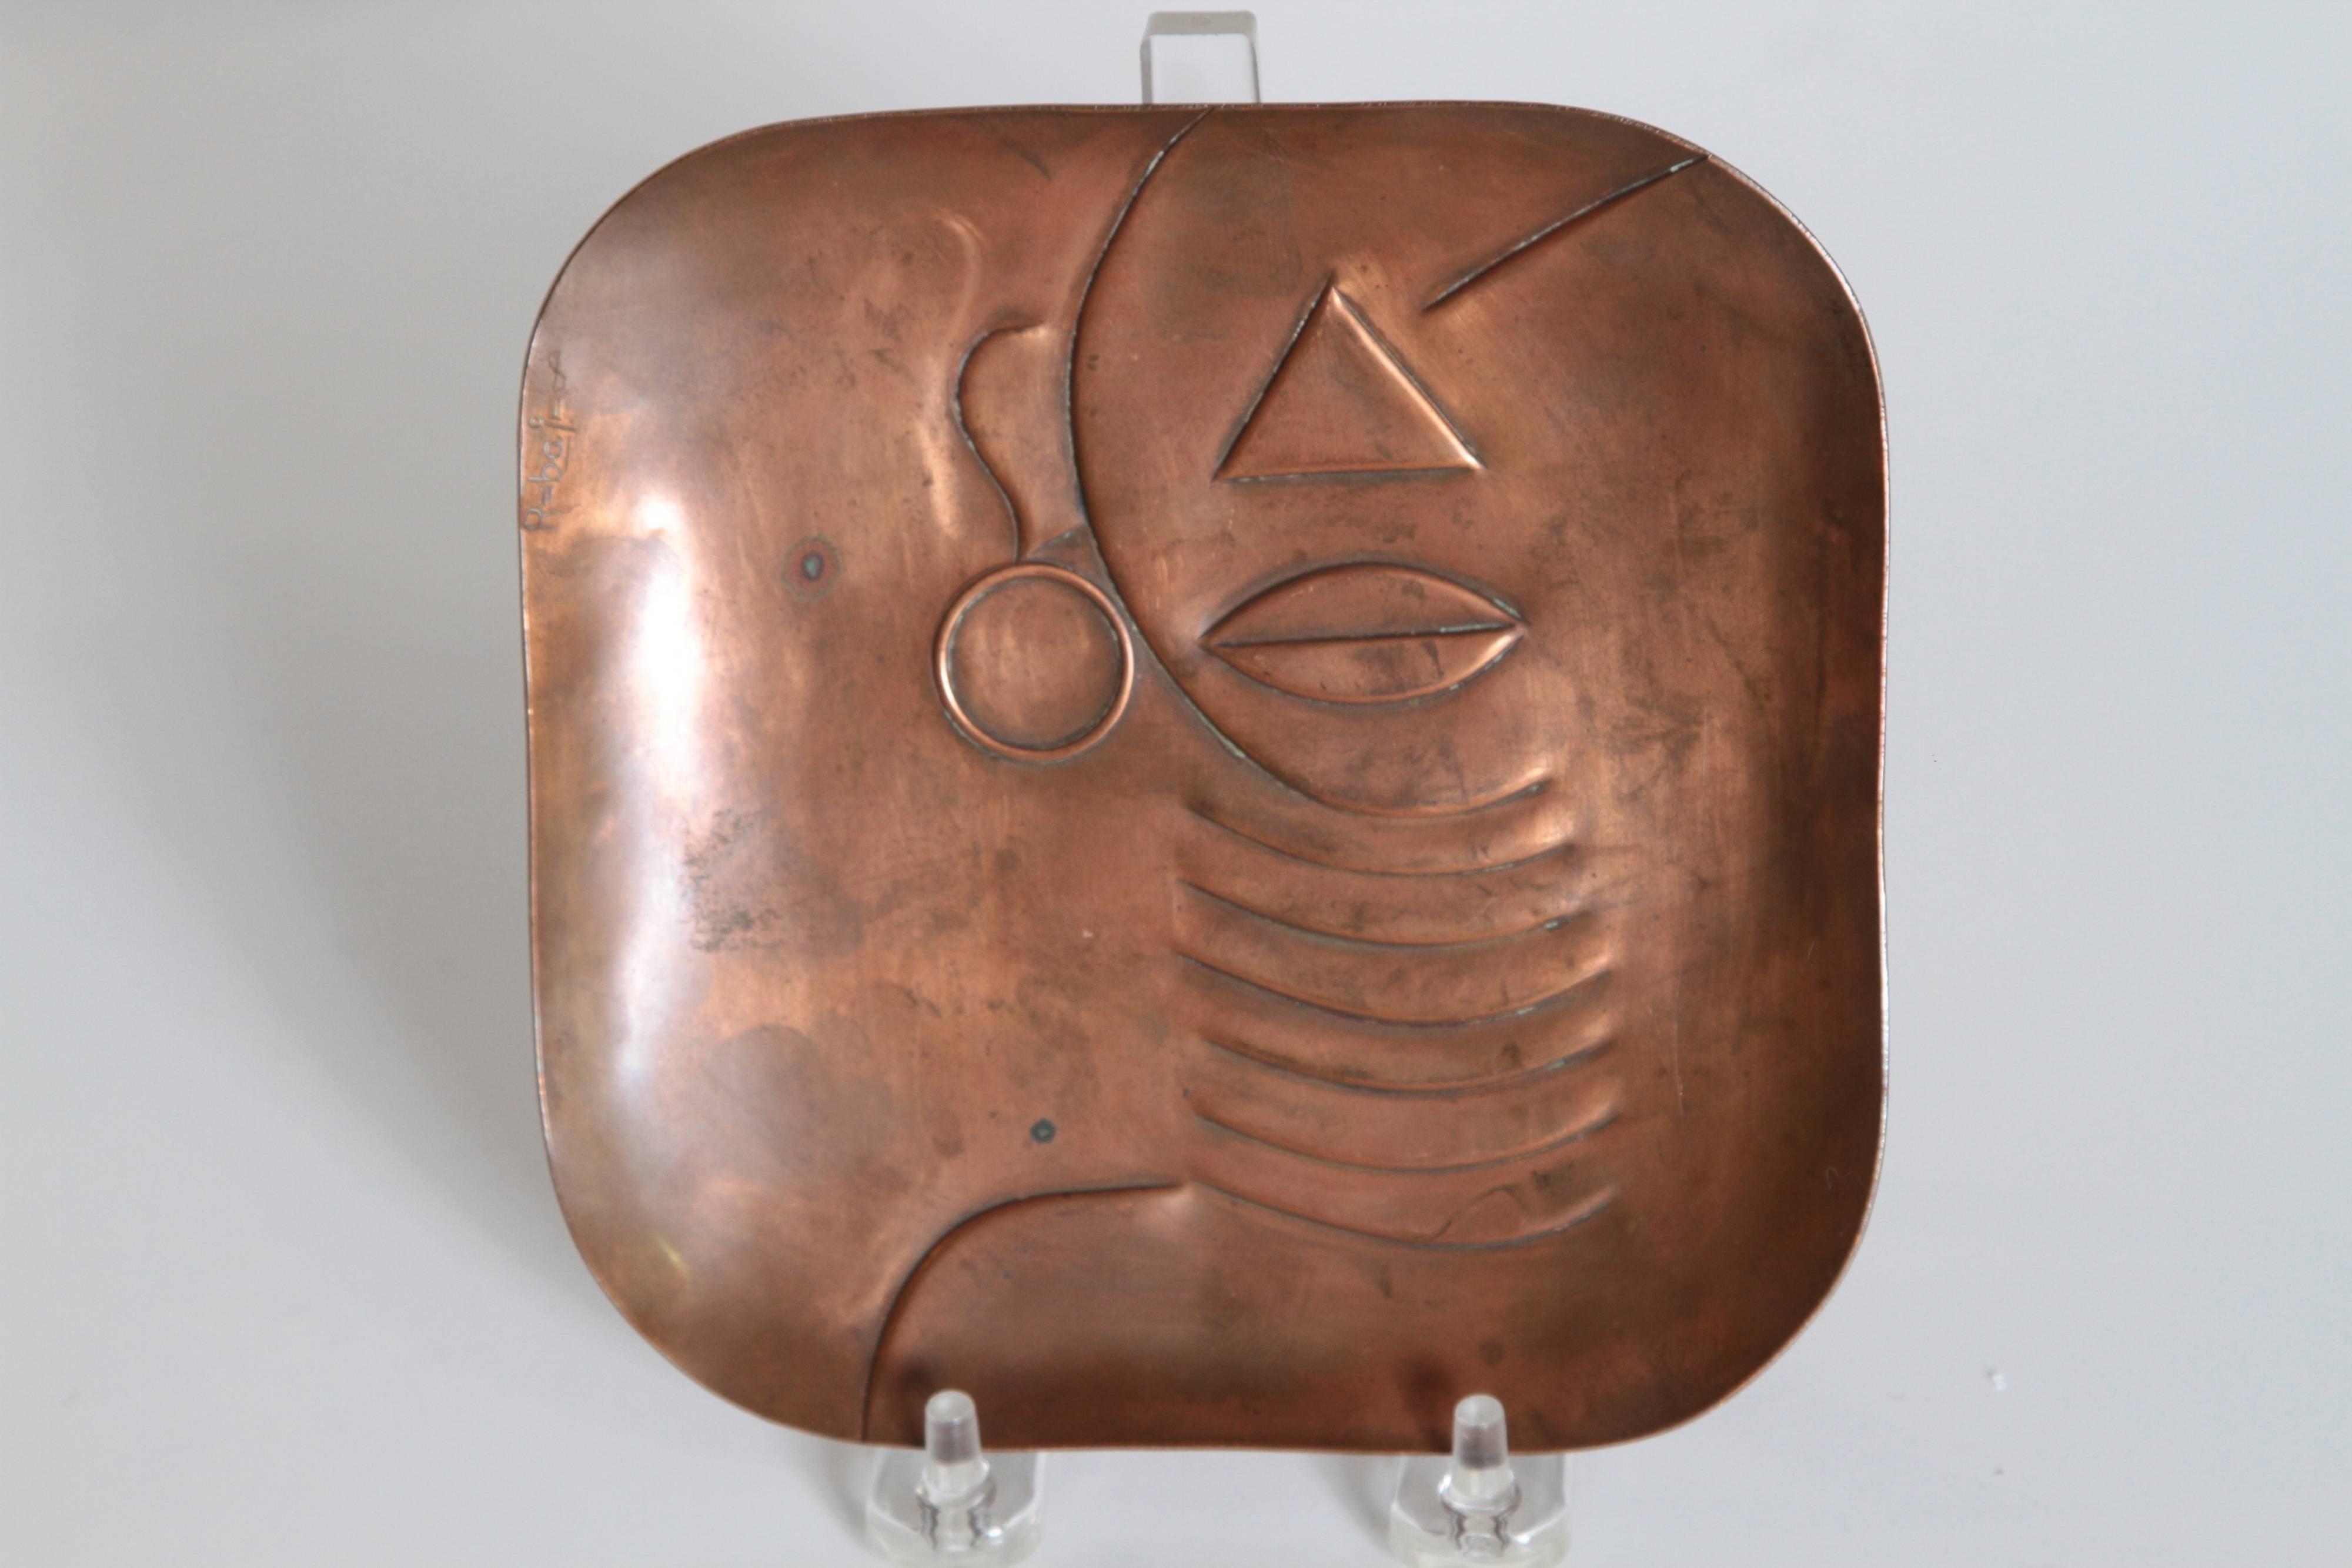 Midcentury Art Deco Original Rebajes Native Hand-Wrought Copper Tray,  Patinated